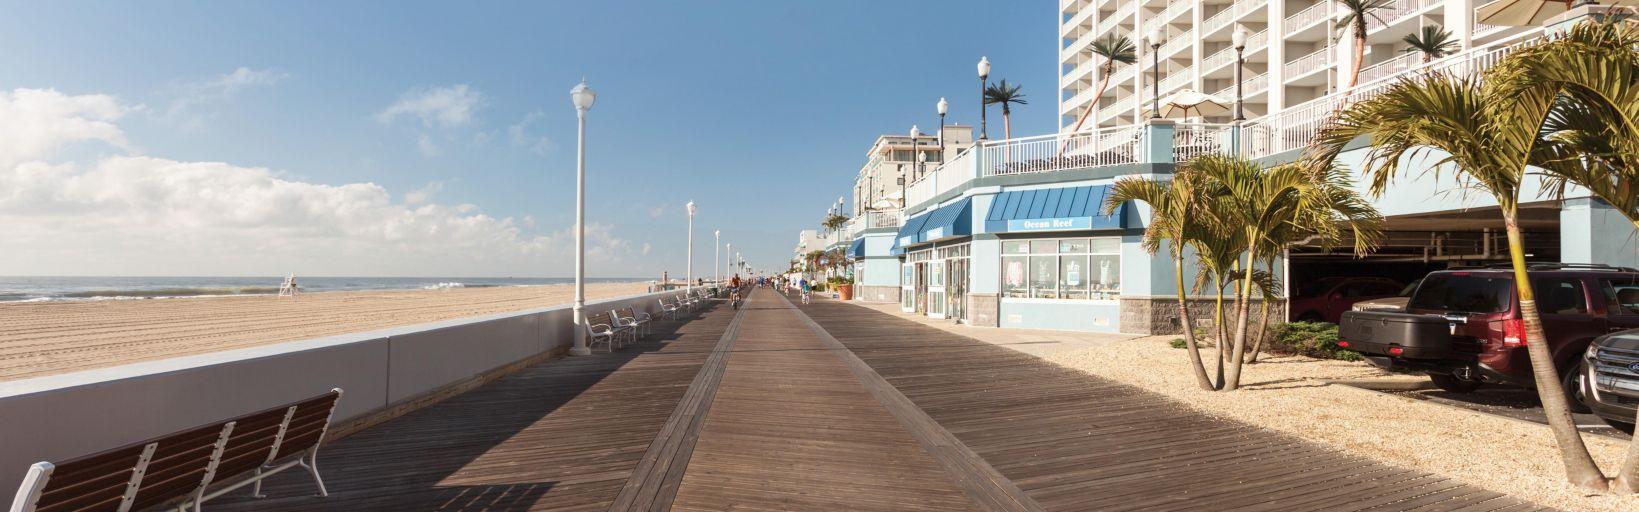 Ocean City Hotel in Maryland - Holiday Inn & Suites Ocean City